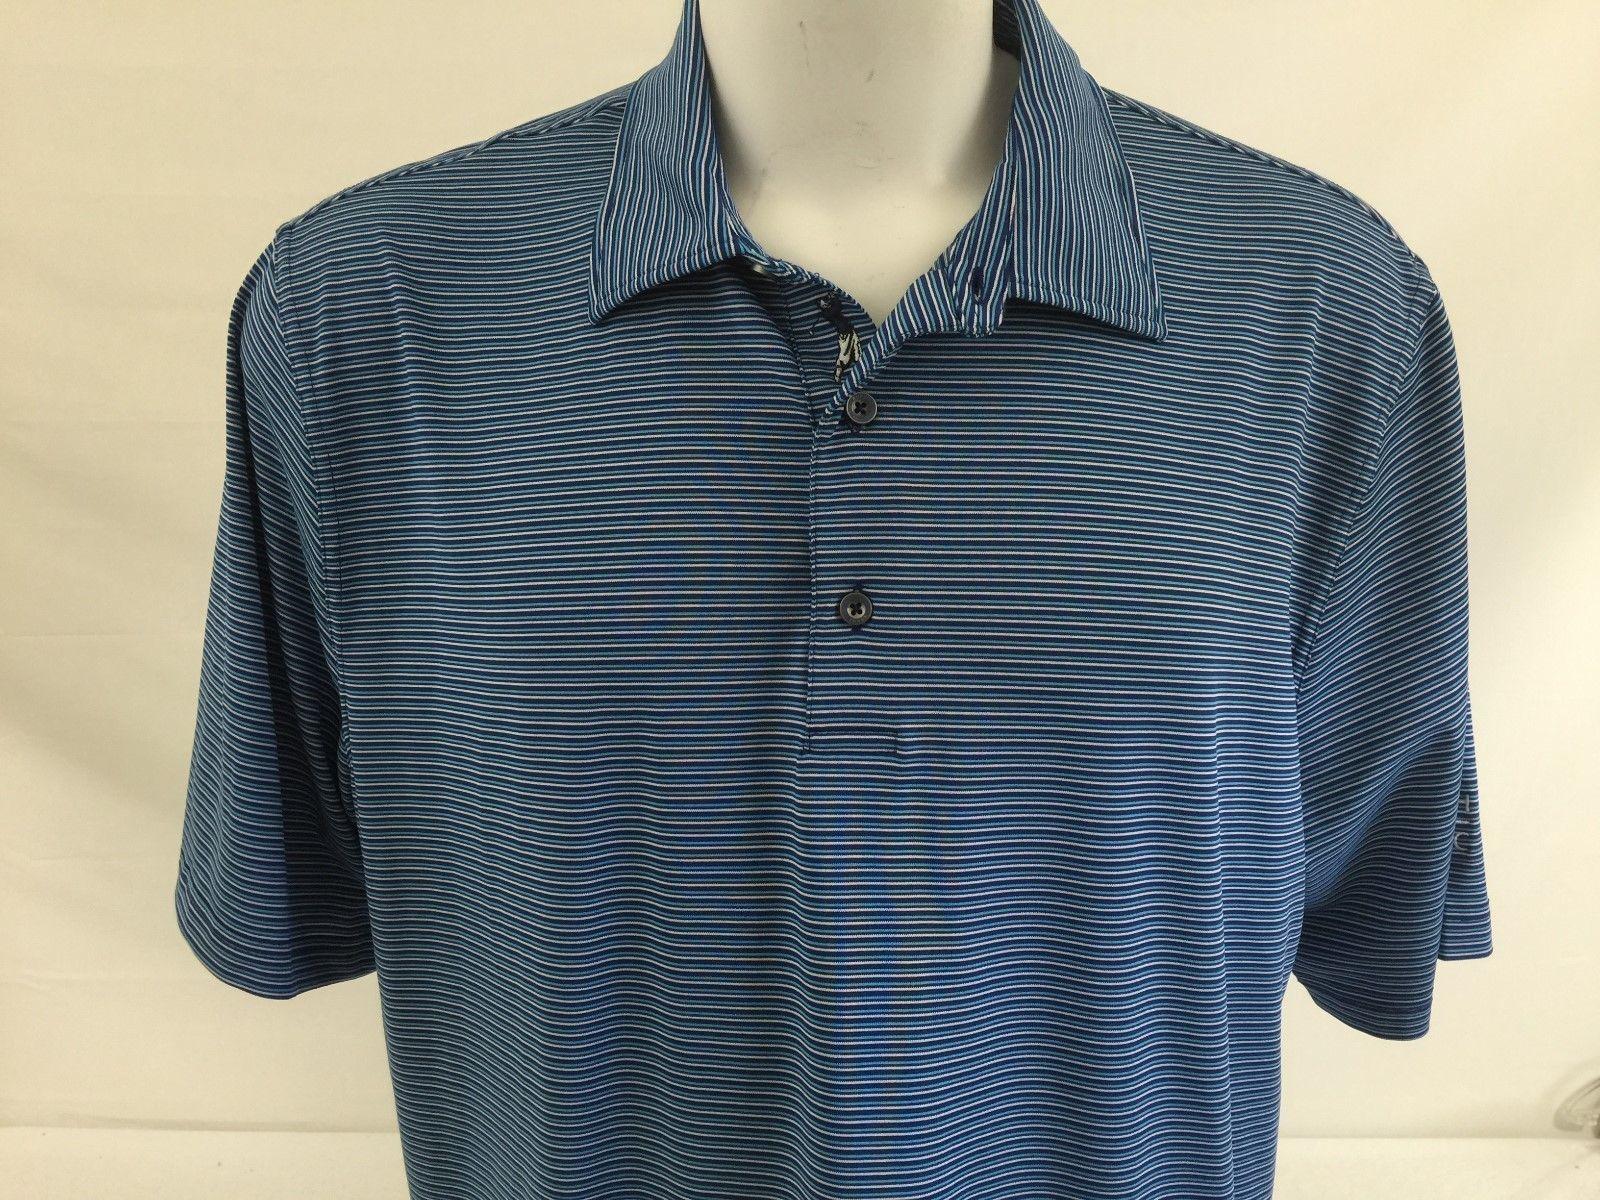 bff1ef7b2 Bobby Jones Mens Golf Shirt Blue Striped and 50 similar items